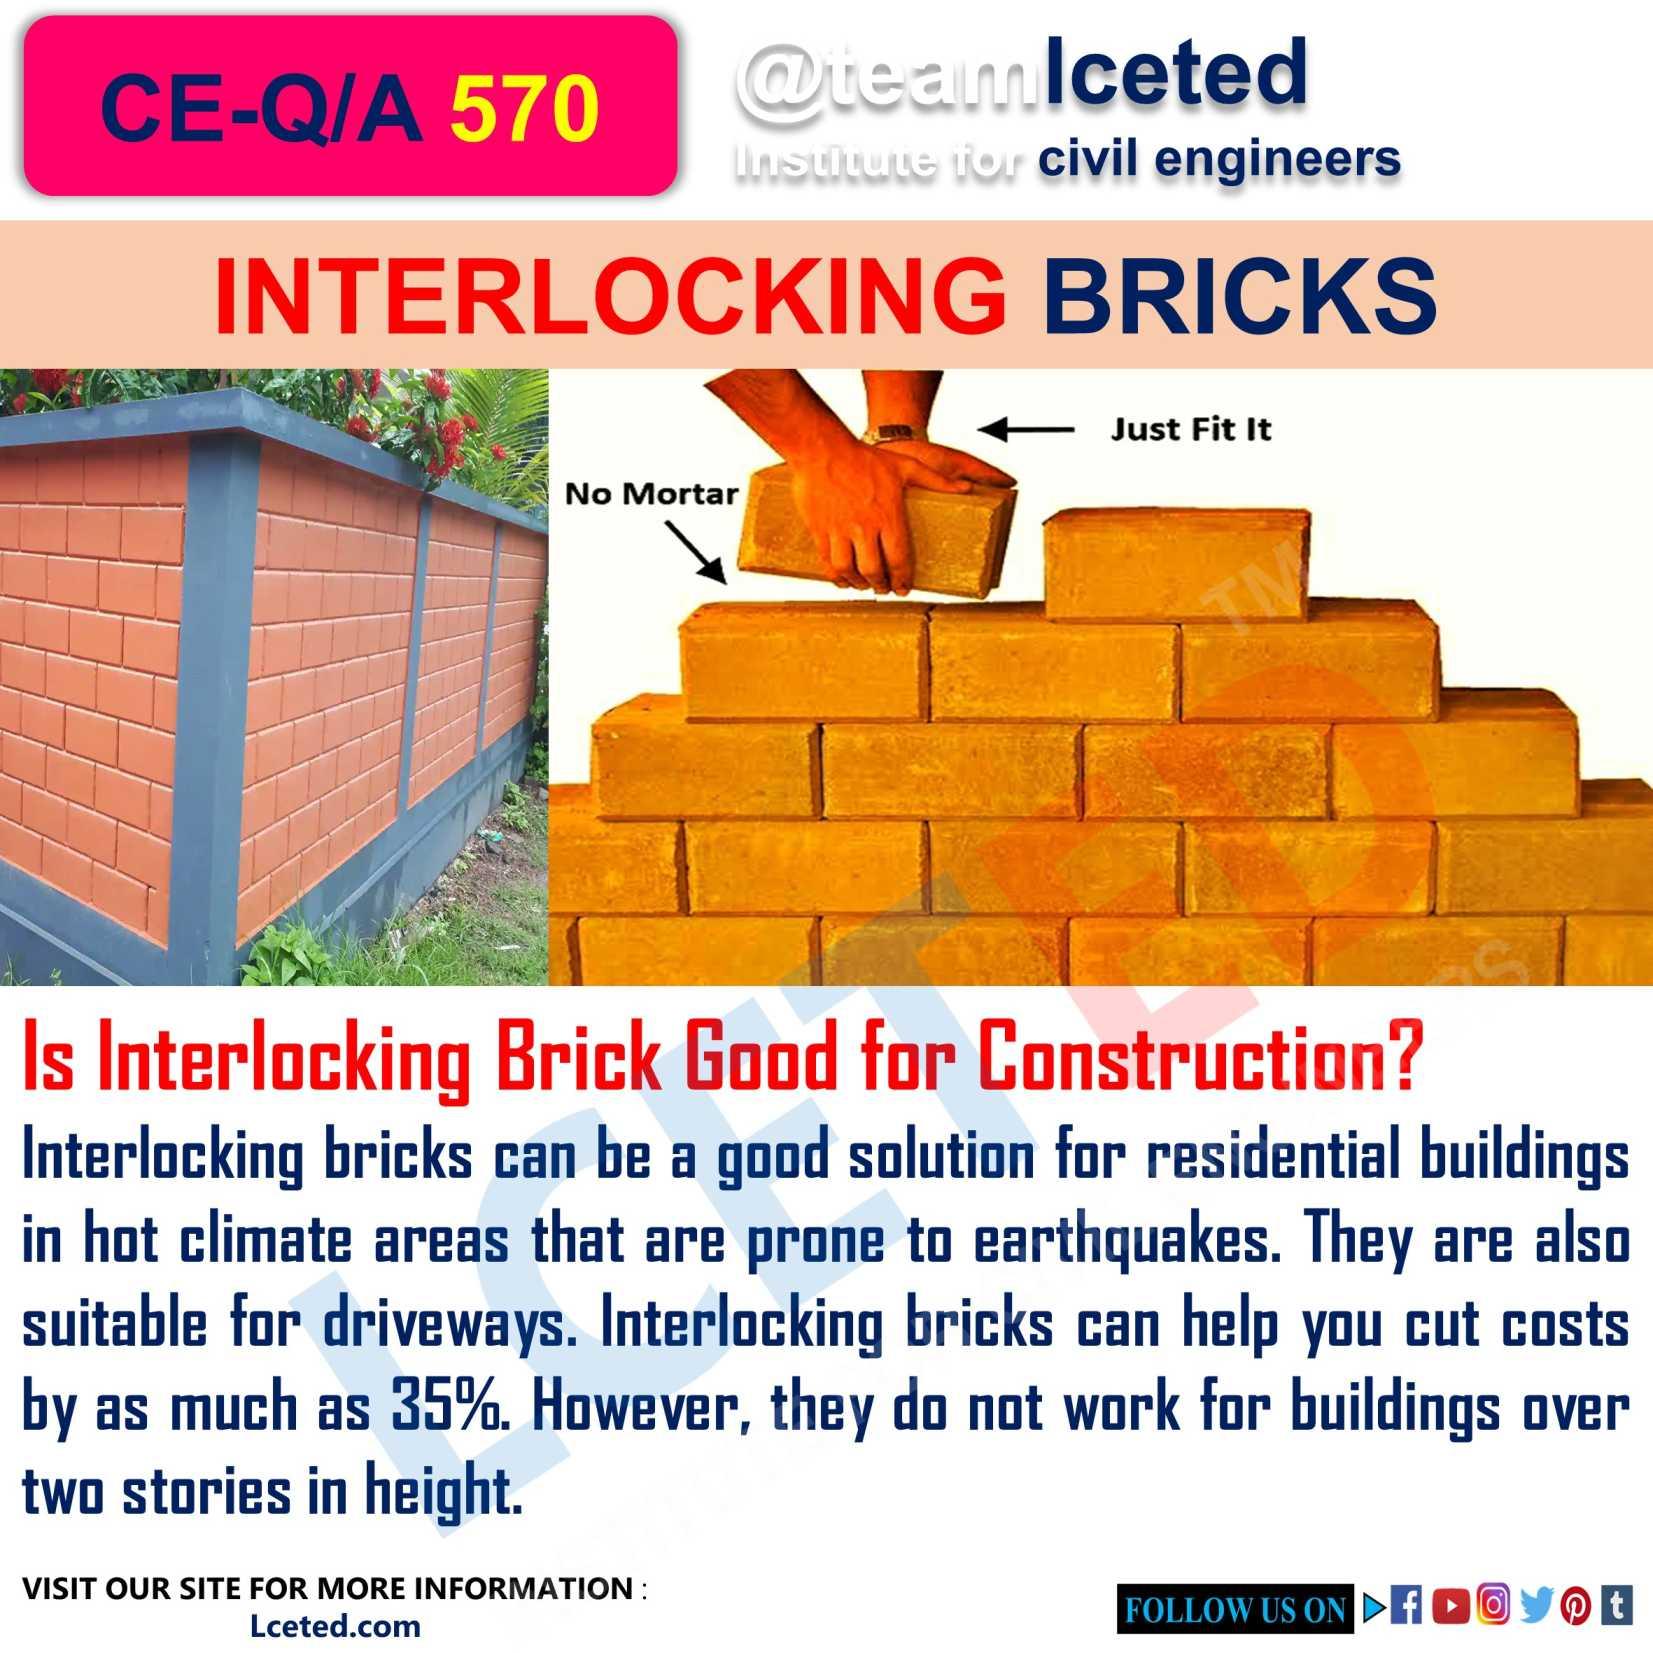 Is Interlocking Brick Good for Construction